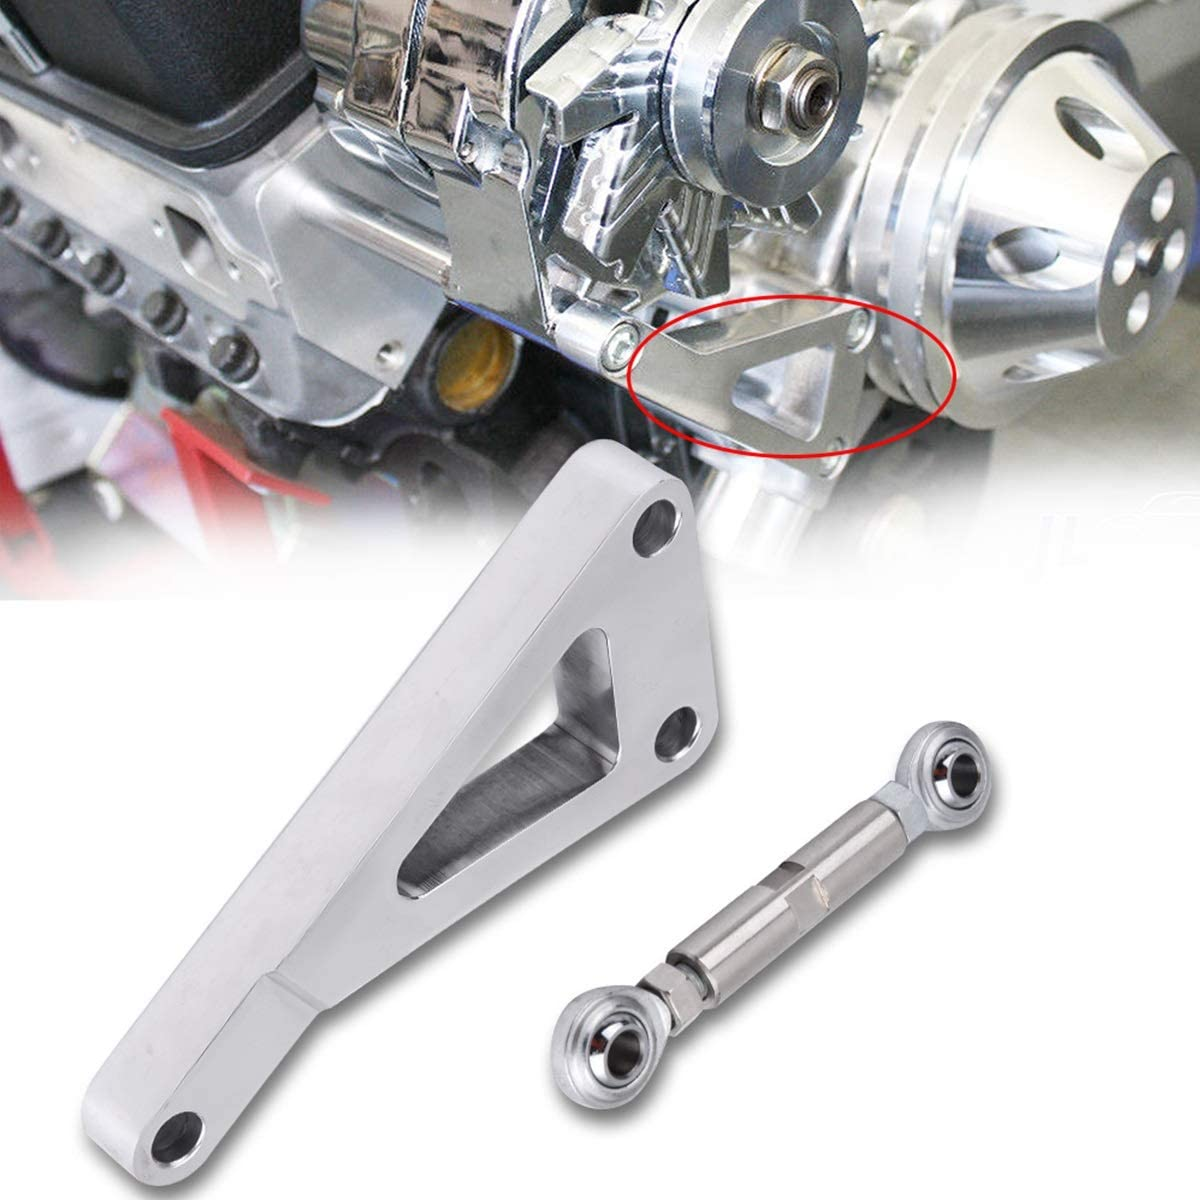 DEALPEAK Automotive Polished Aluminum Alternator Bracket Kit Water Pump Lwp Bracket Set for Car Chevy SBC 350